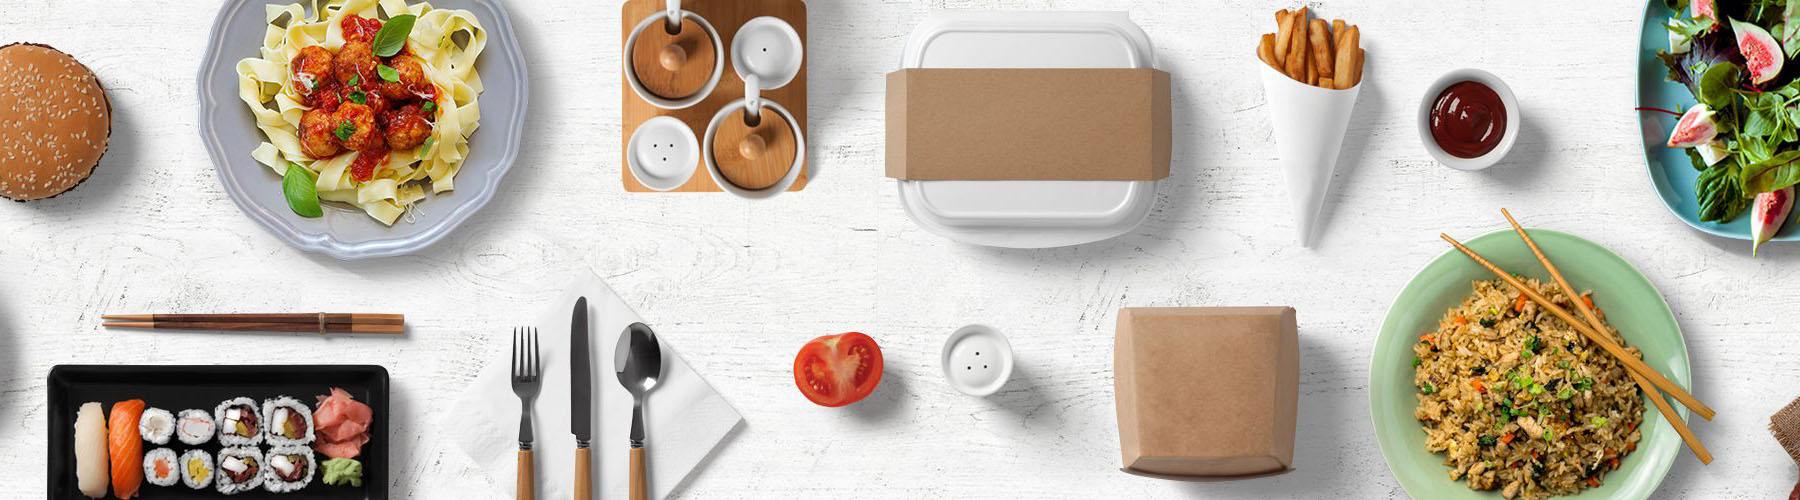 Prime Members: First Amazon Restaurants Order $15 off $20 - YMMV